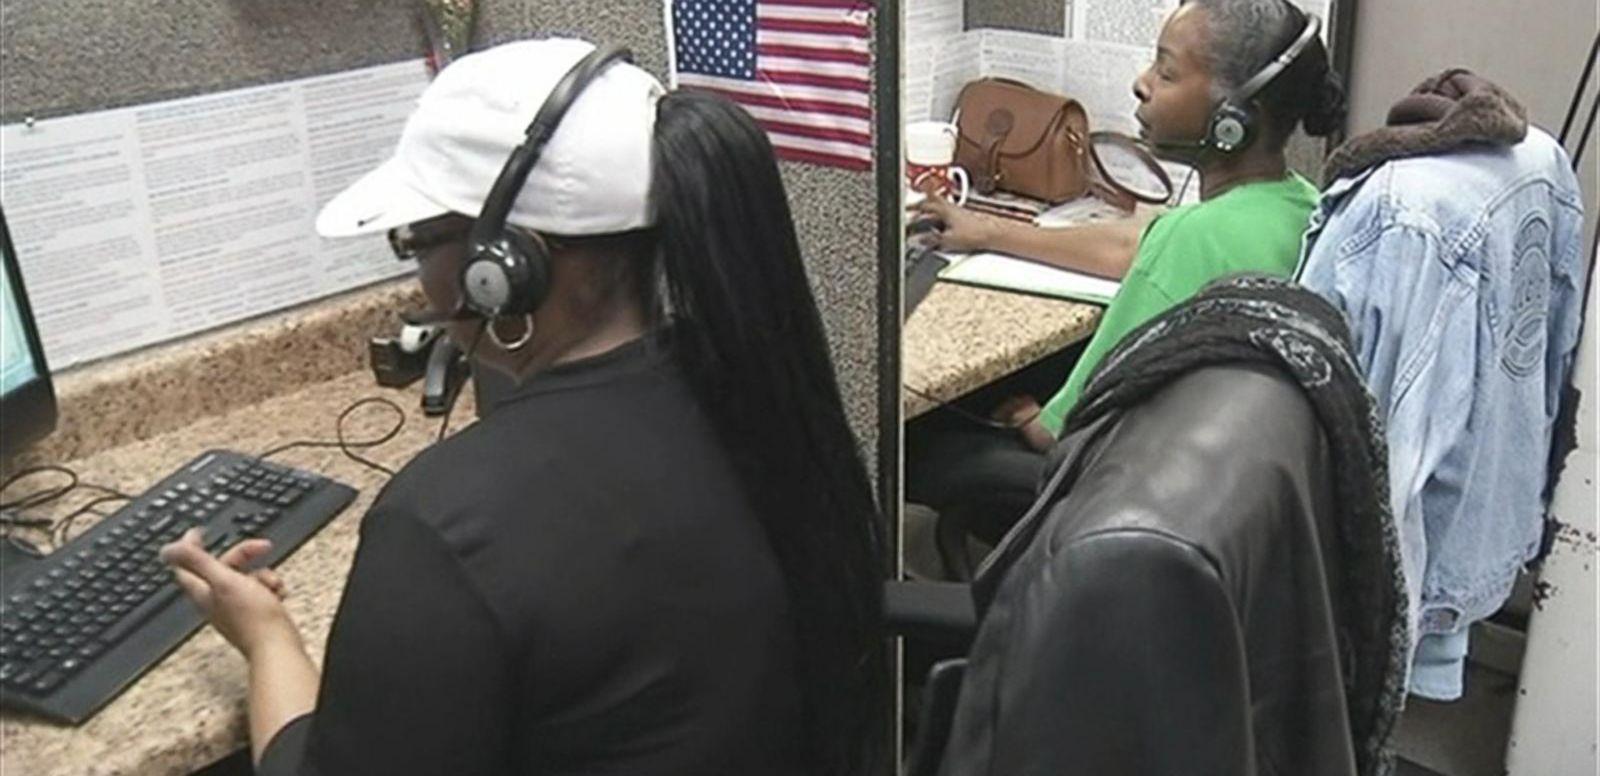 VIDEO: Las Vegas Telemarketer Helps Save Oregon Woman's Life